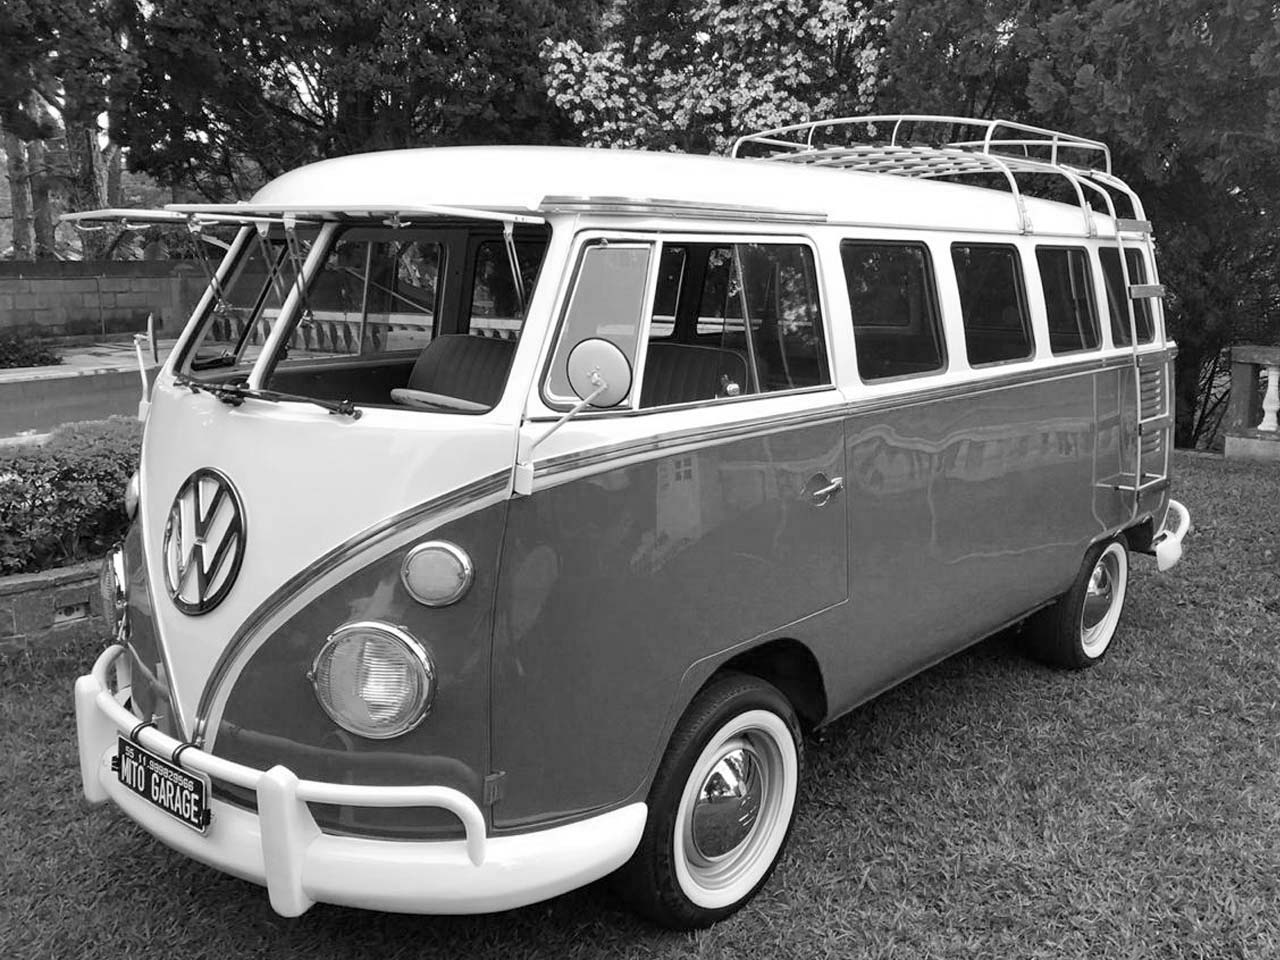 VW Kombi Vermelha e Branca 1974